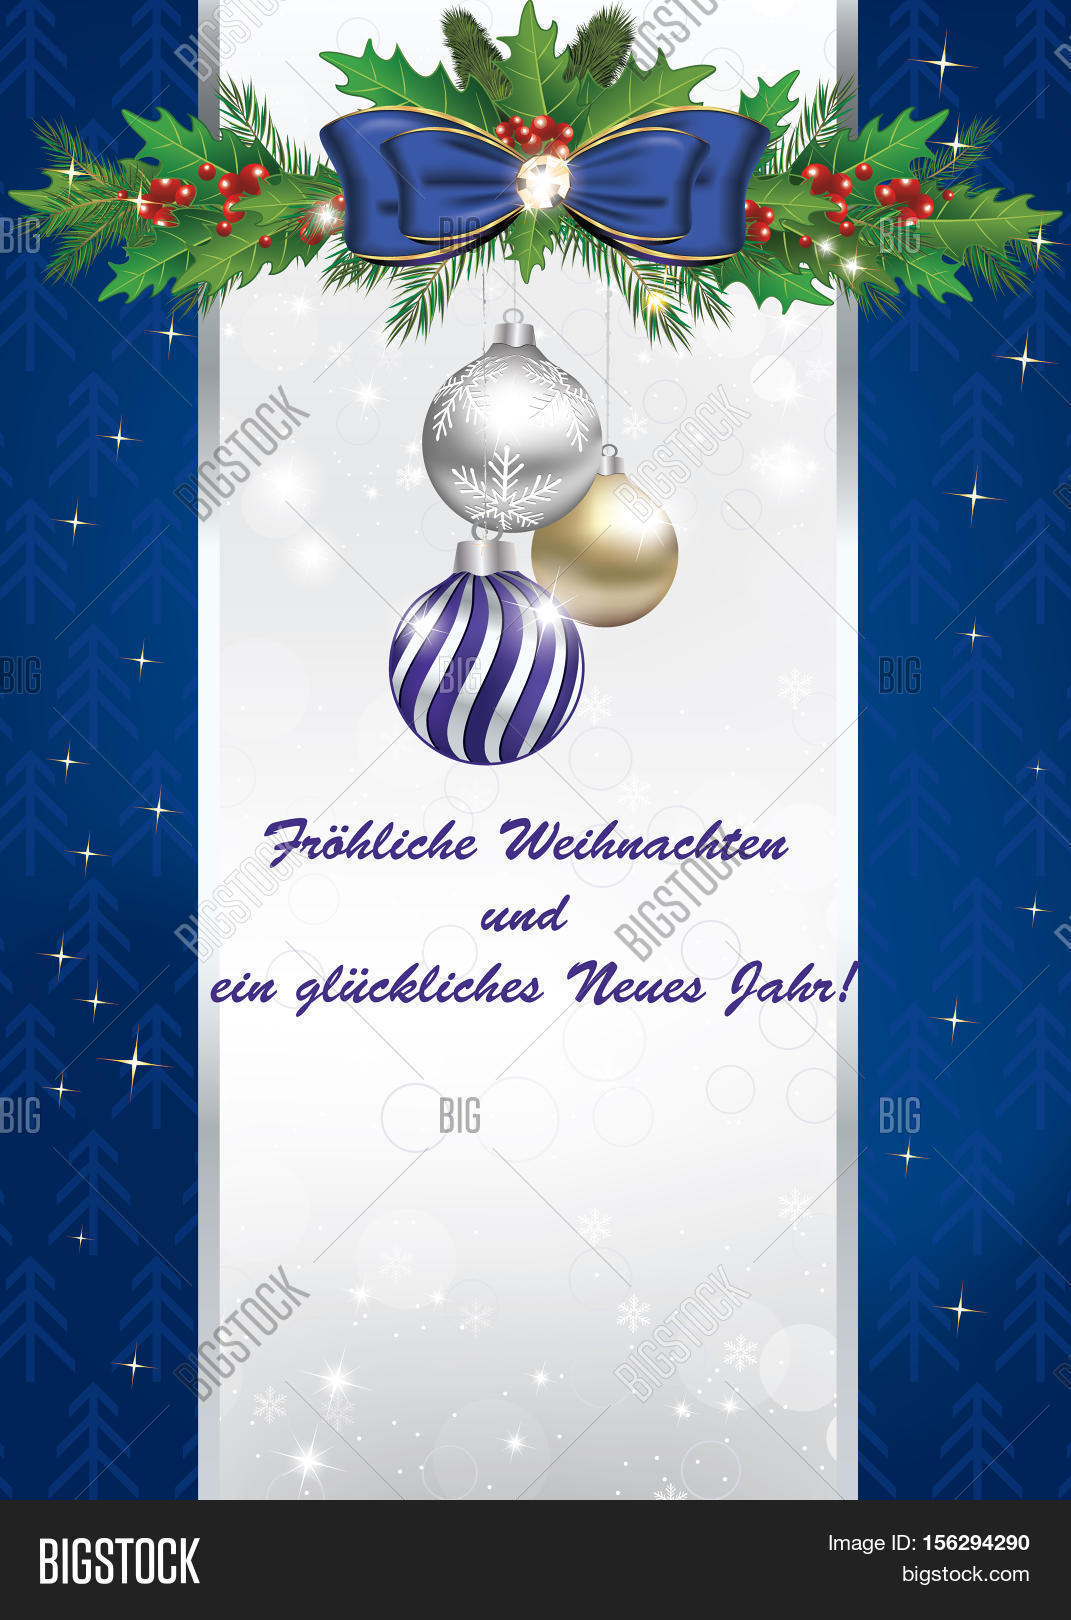 Blue Winter Holidays Image Photo Free Trial Bigstock